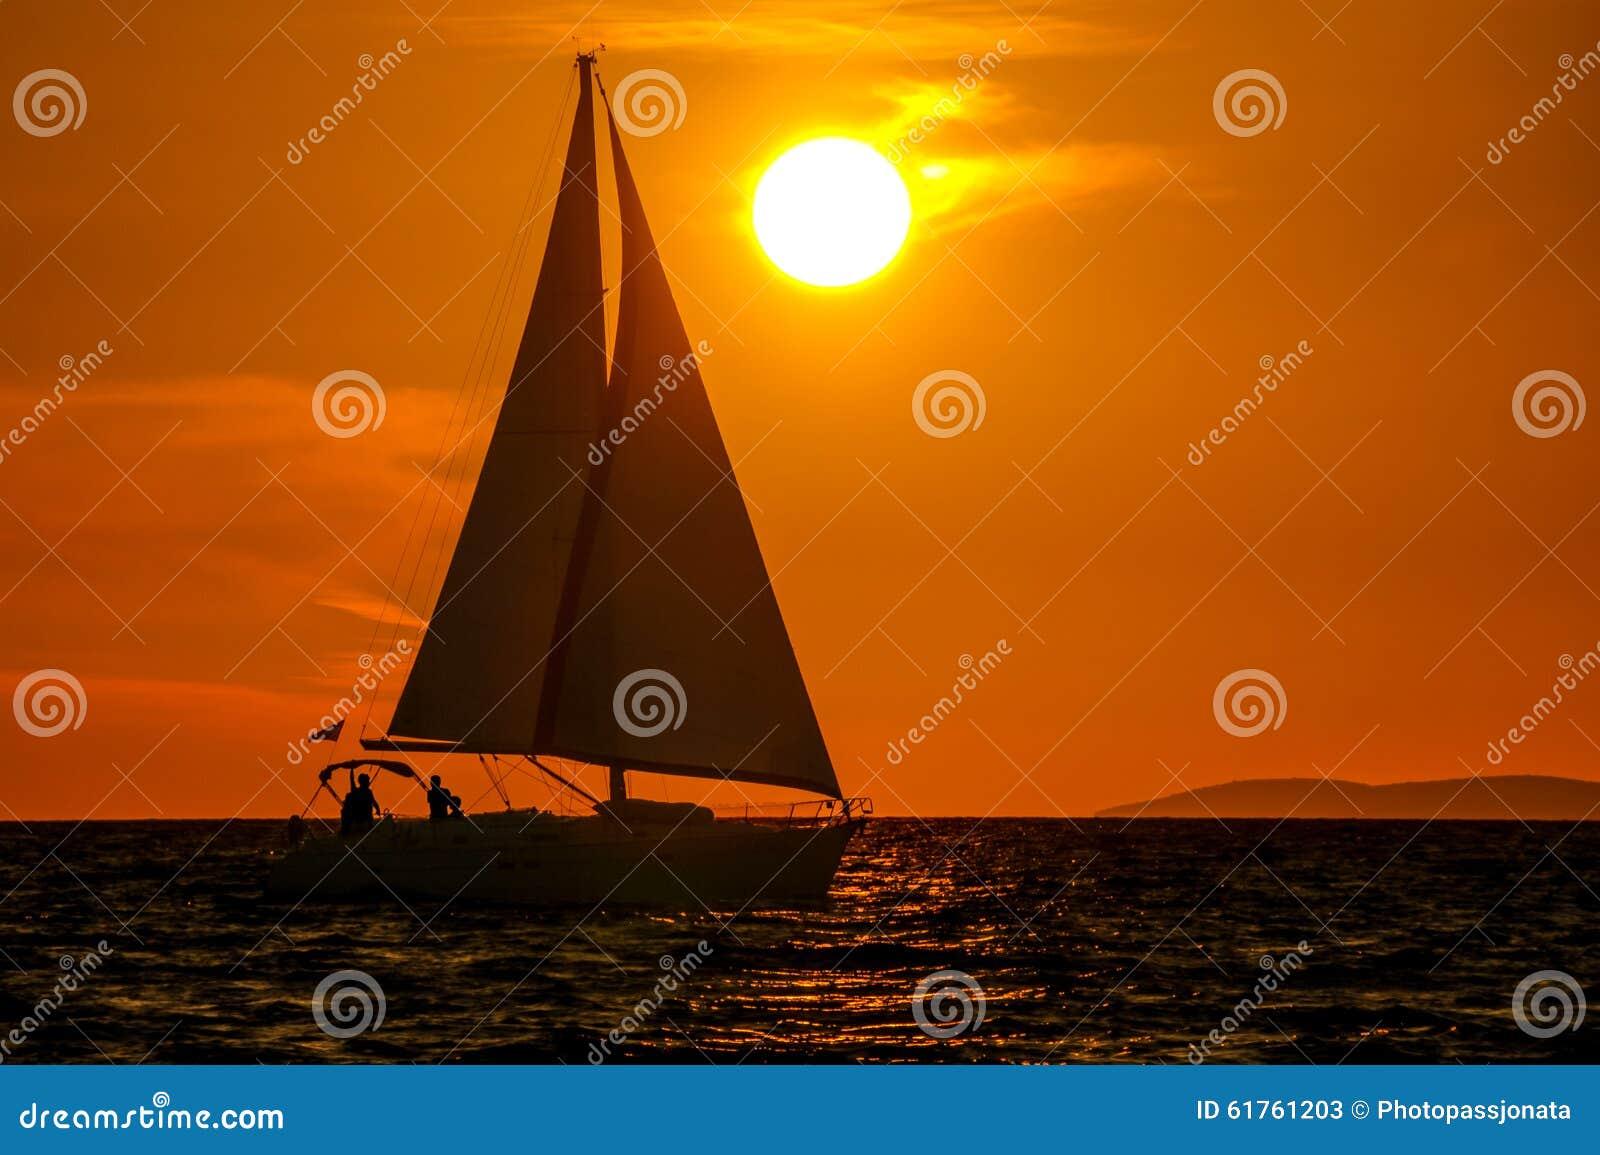 Sailboat-sunset-orange sky